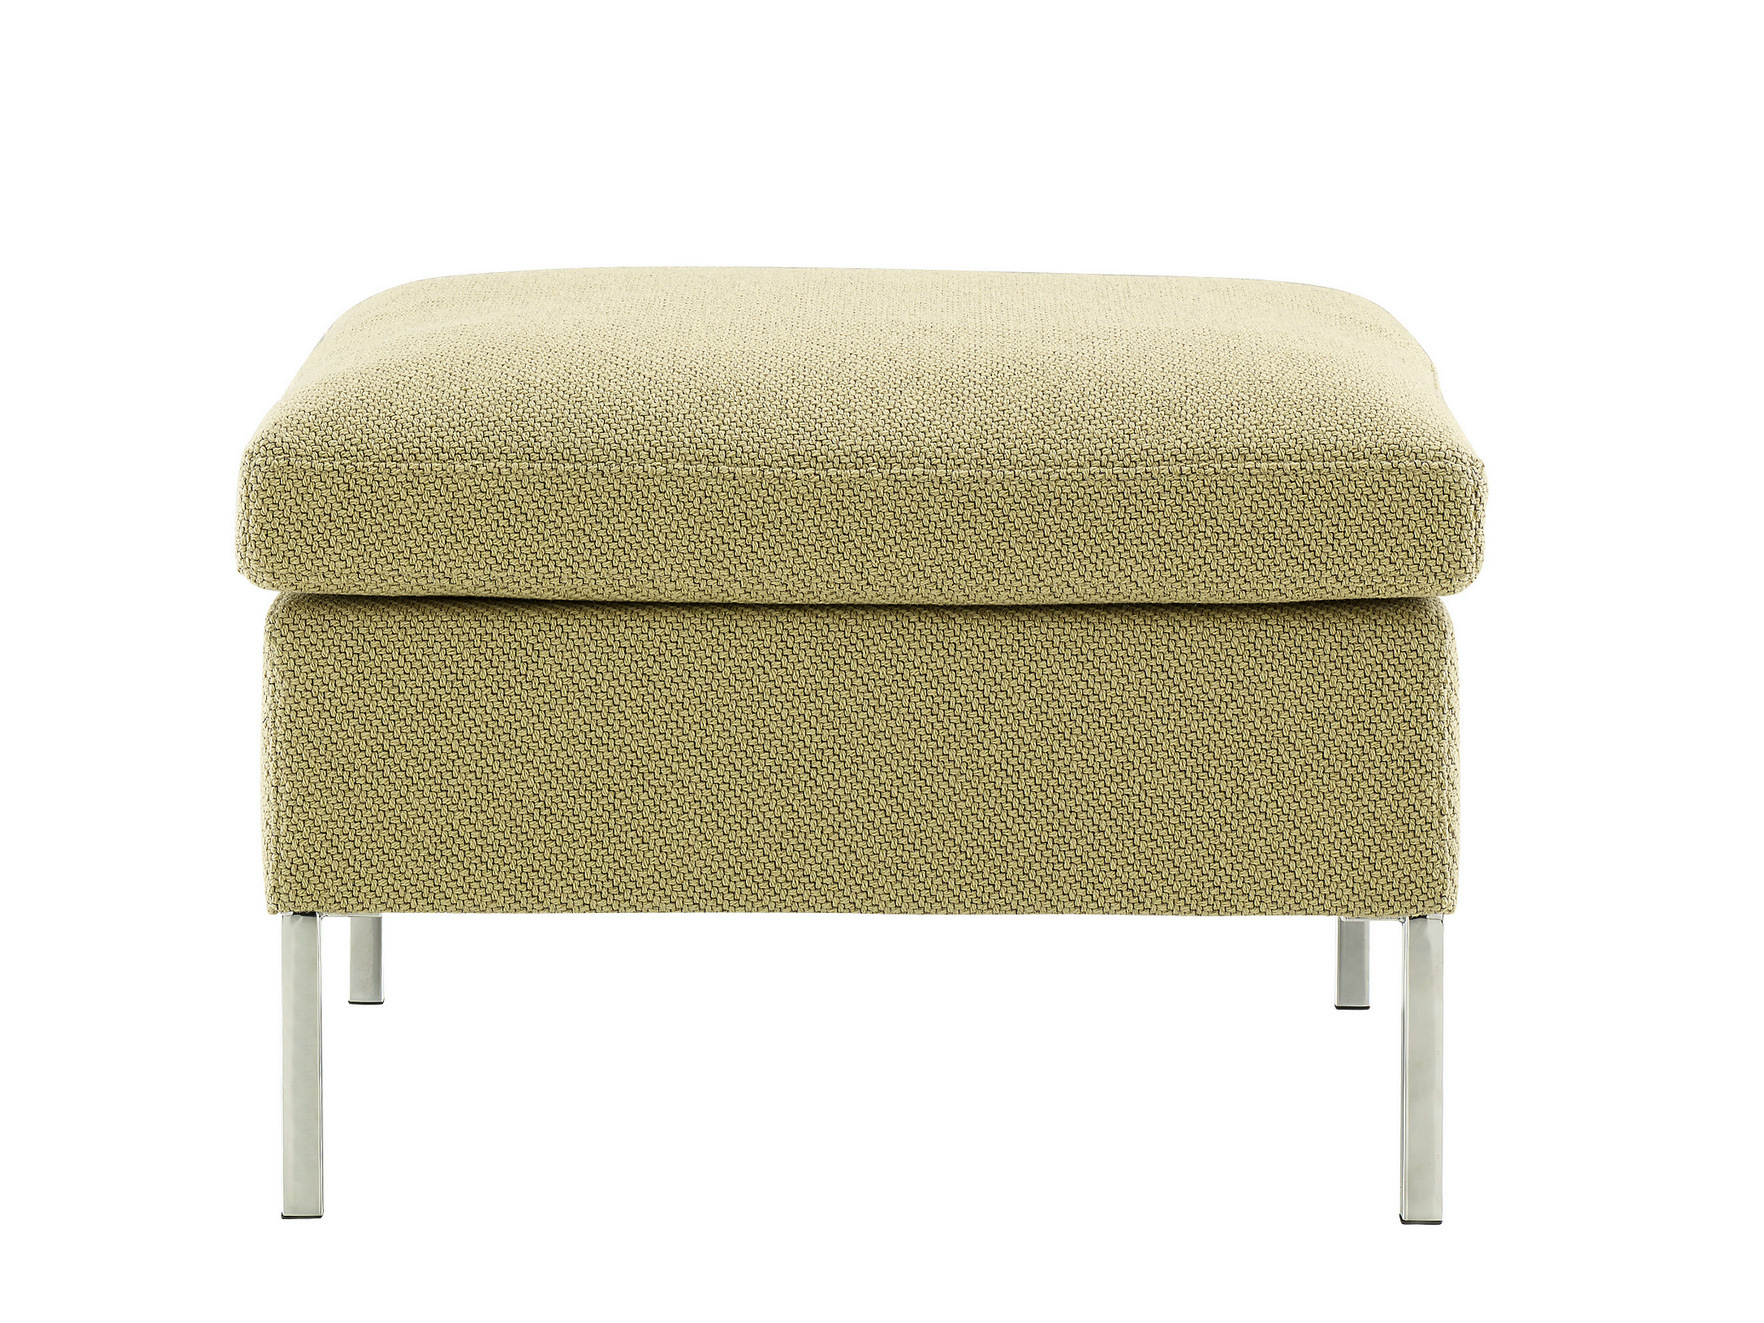 upholstered fabric pouf hudson collection by roset italia design didier gomez. Black Bedroom Furniture Sets. Home Design Ideas